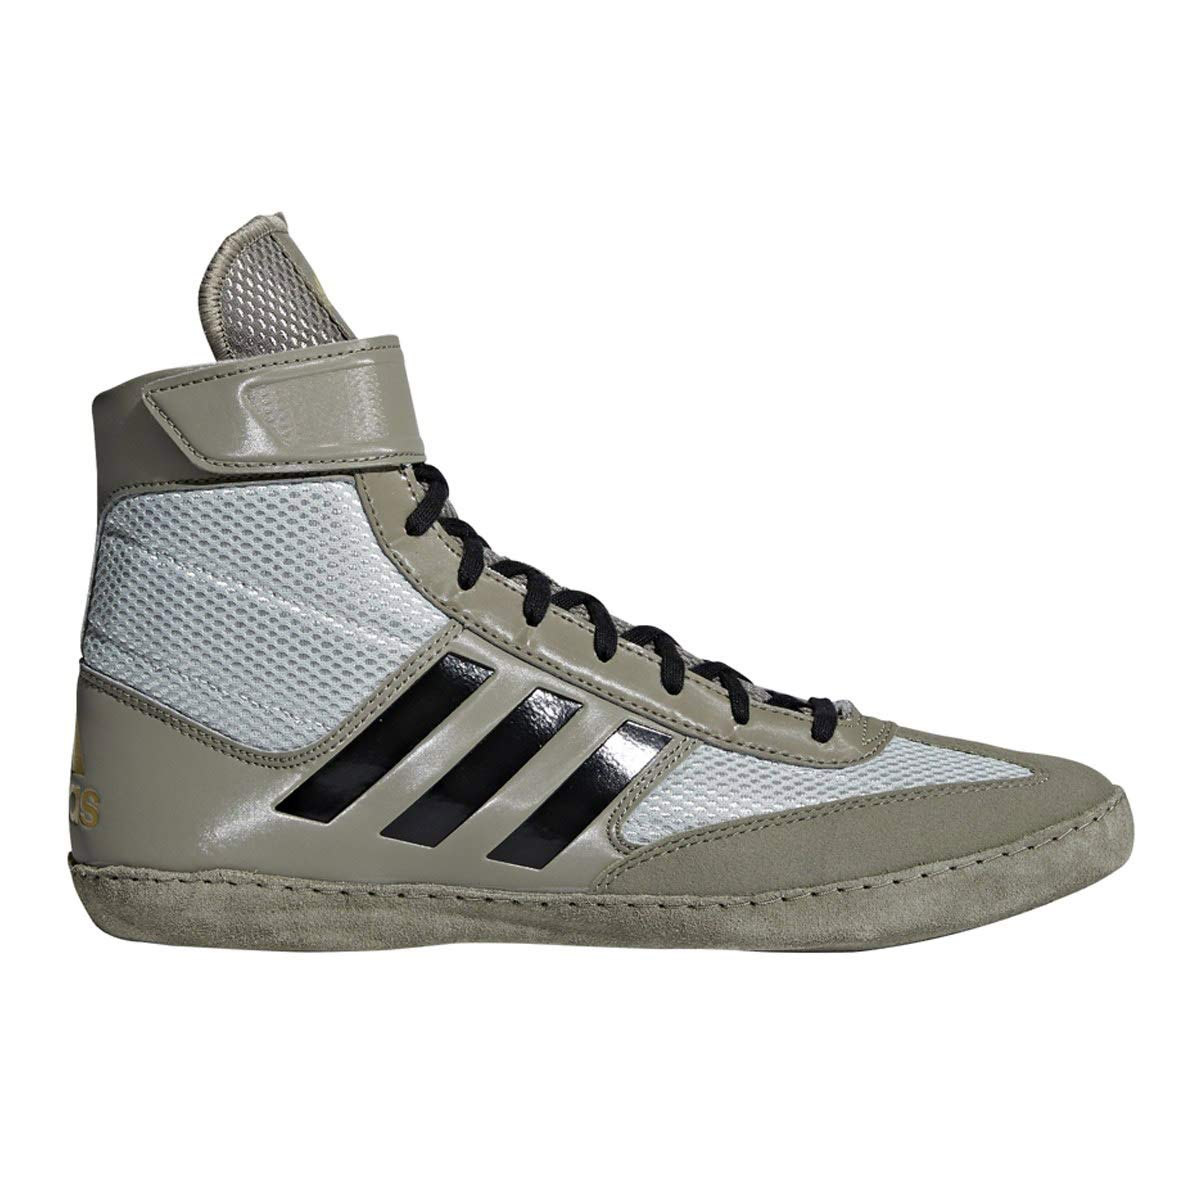 Peau Peau Peau Adidas Performance pour Homme Combat Speed. 5 Wrestling-chaussures 741